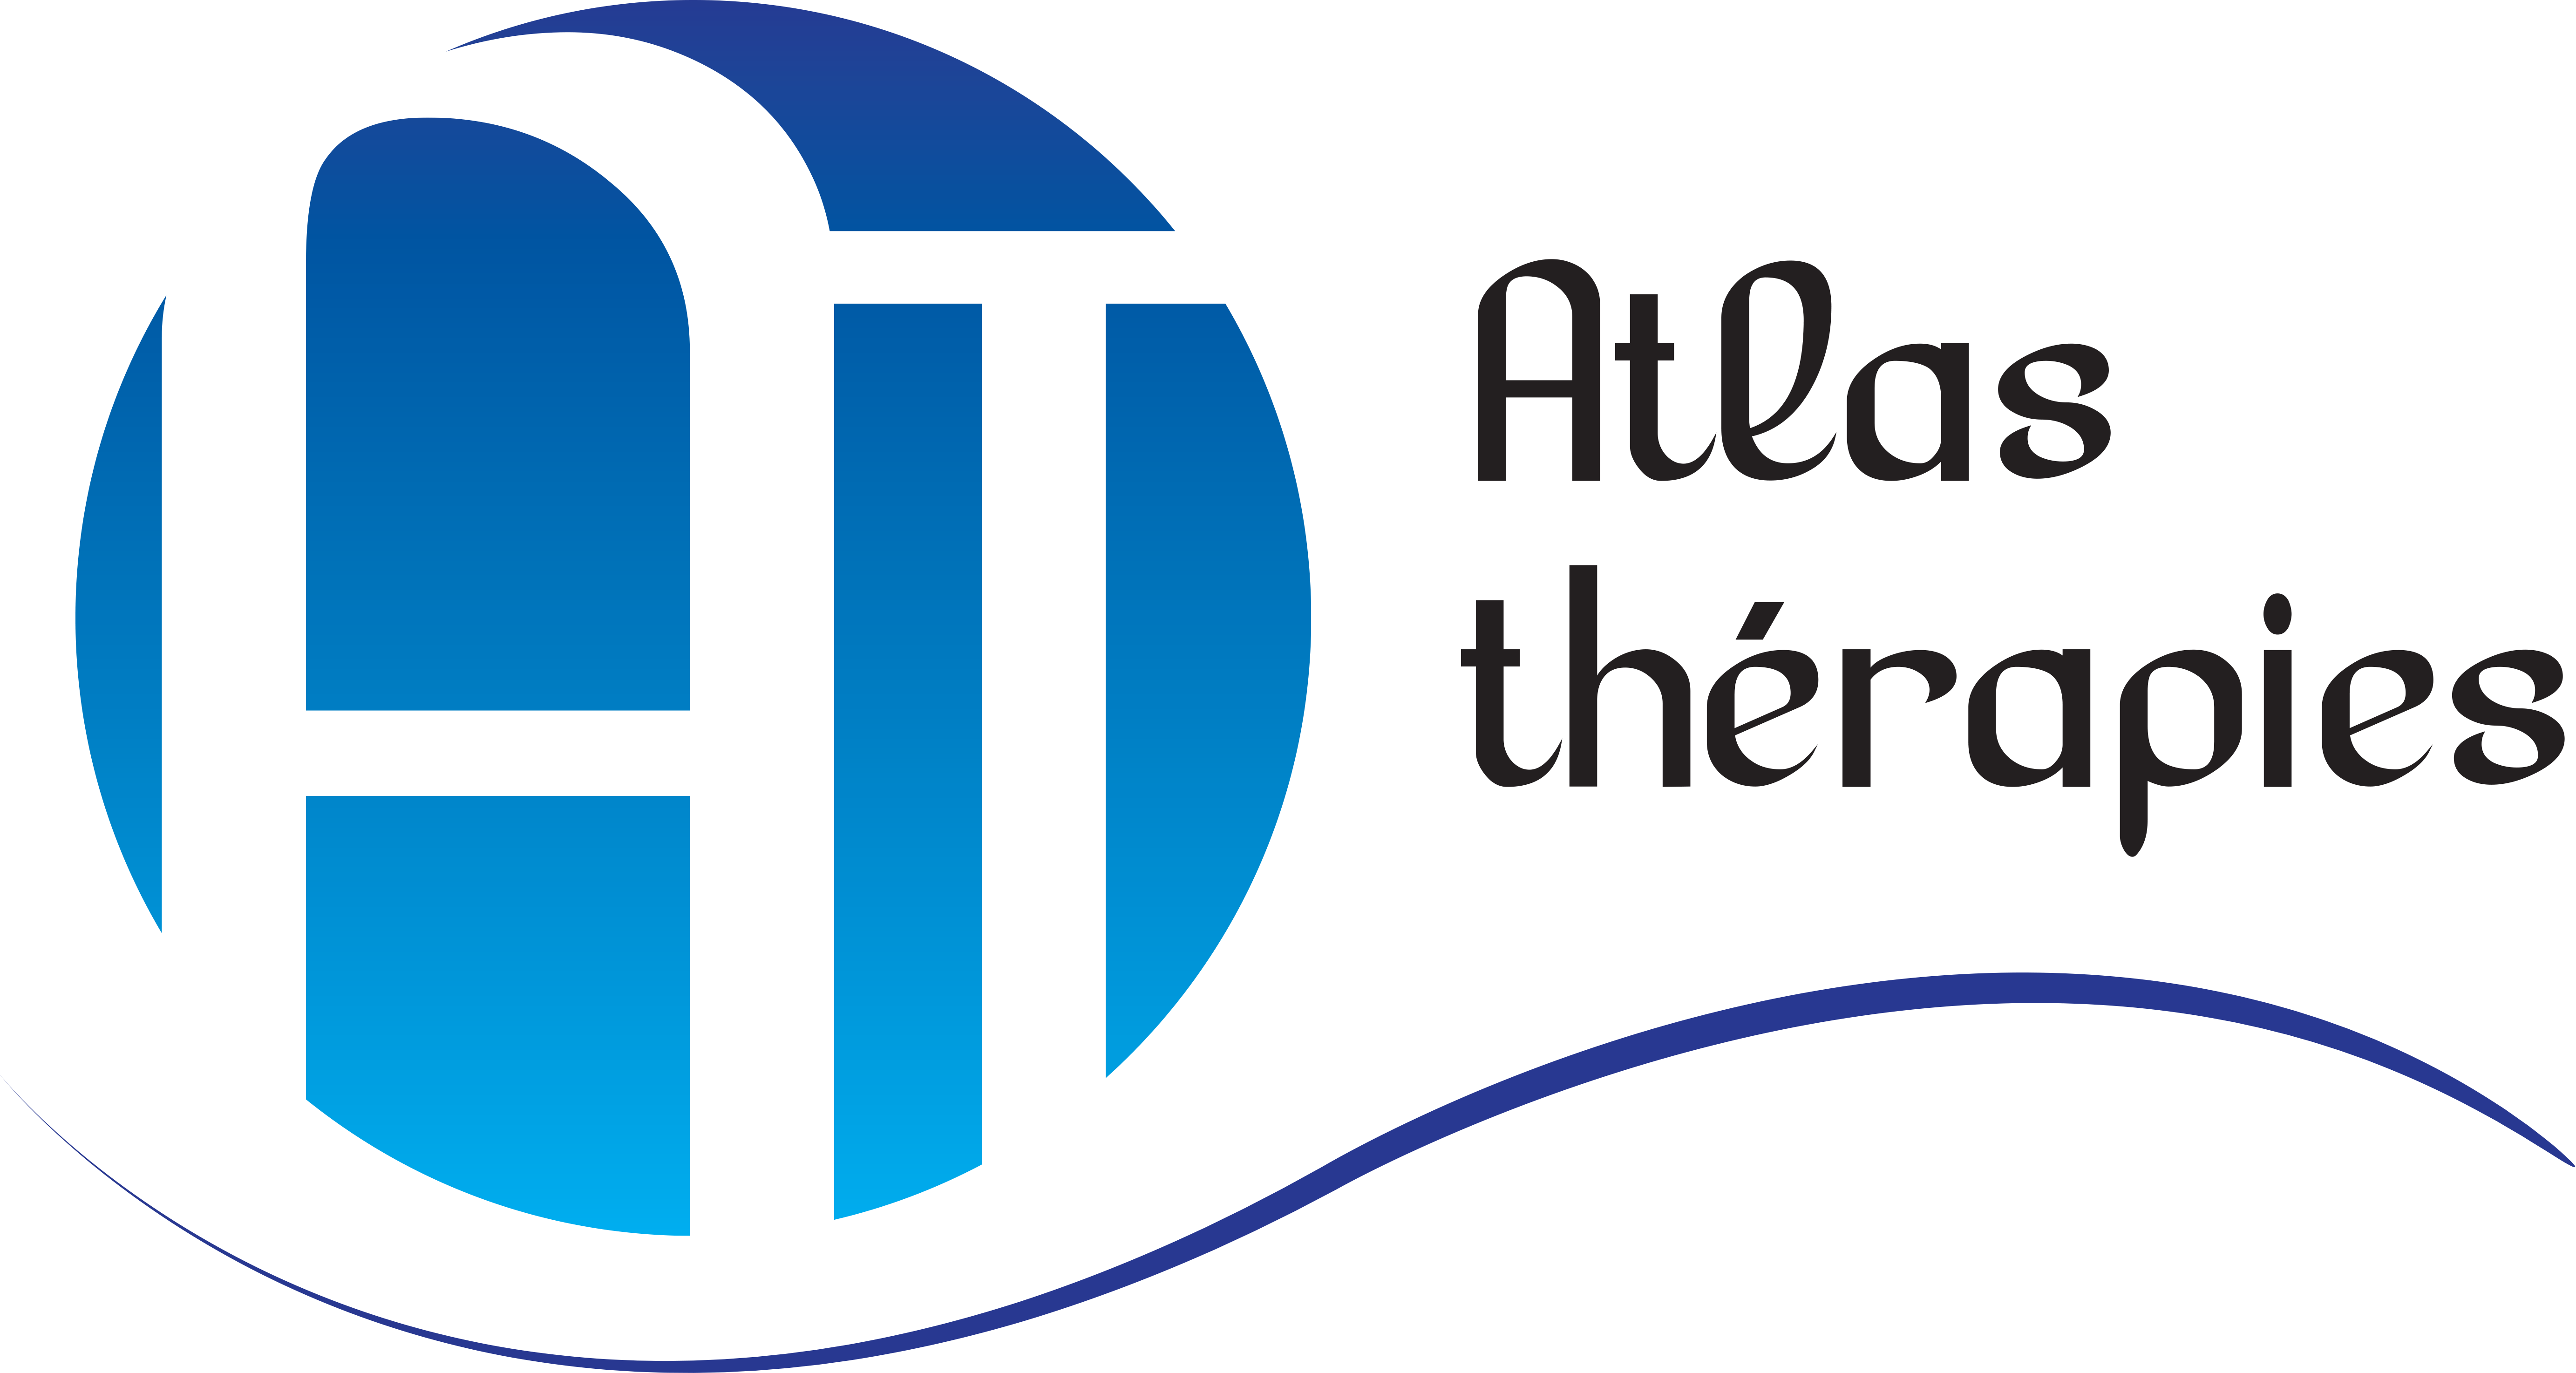 Atlas thérapies